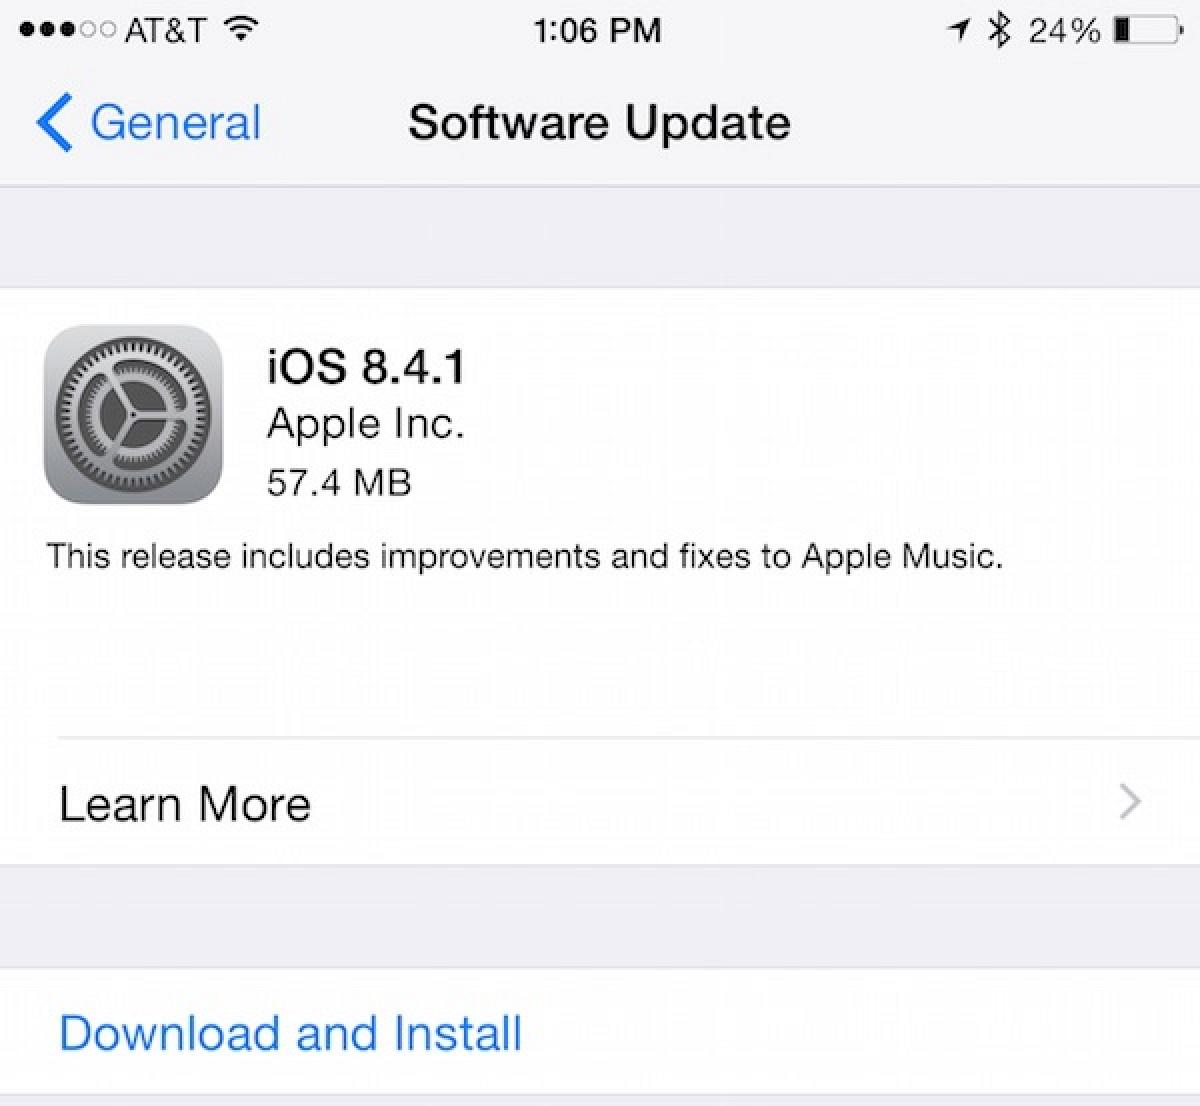 Программа iTunes обновлена до версии 12.2.2